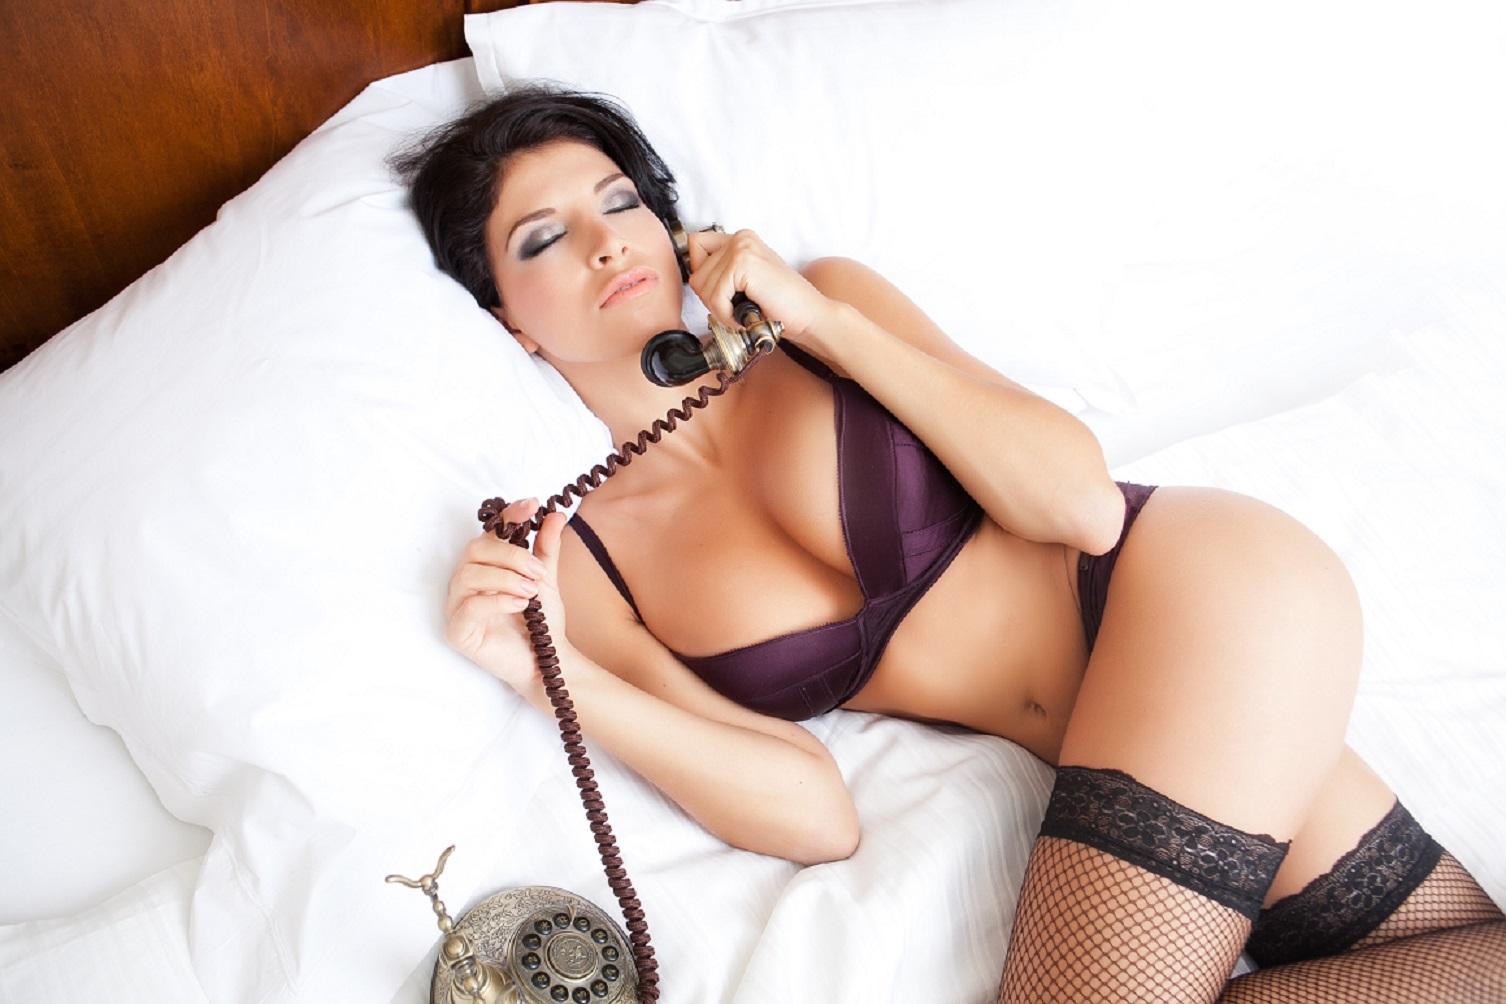 dial sexe torride avec salope au tel